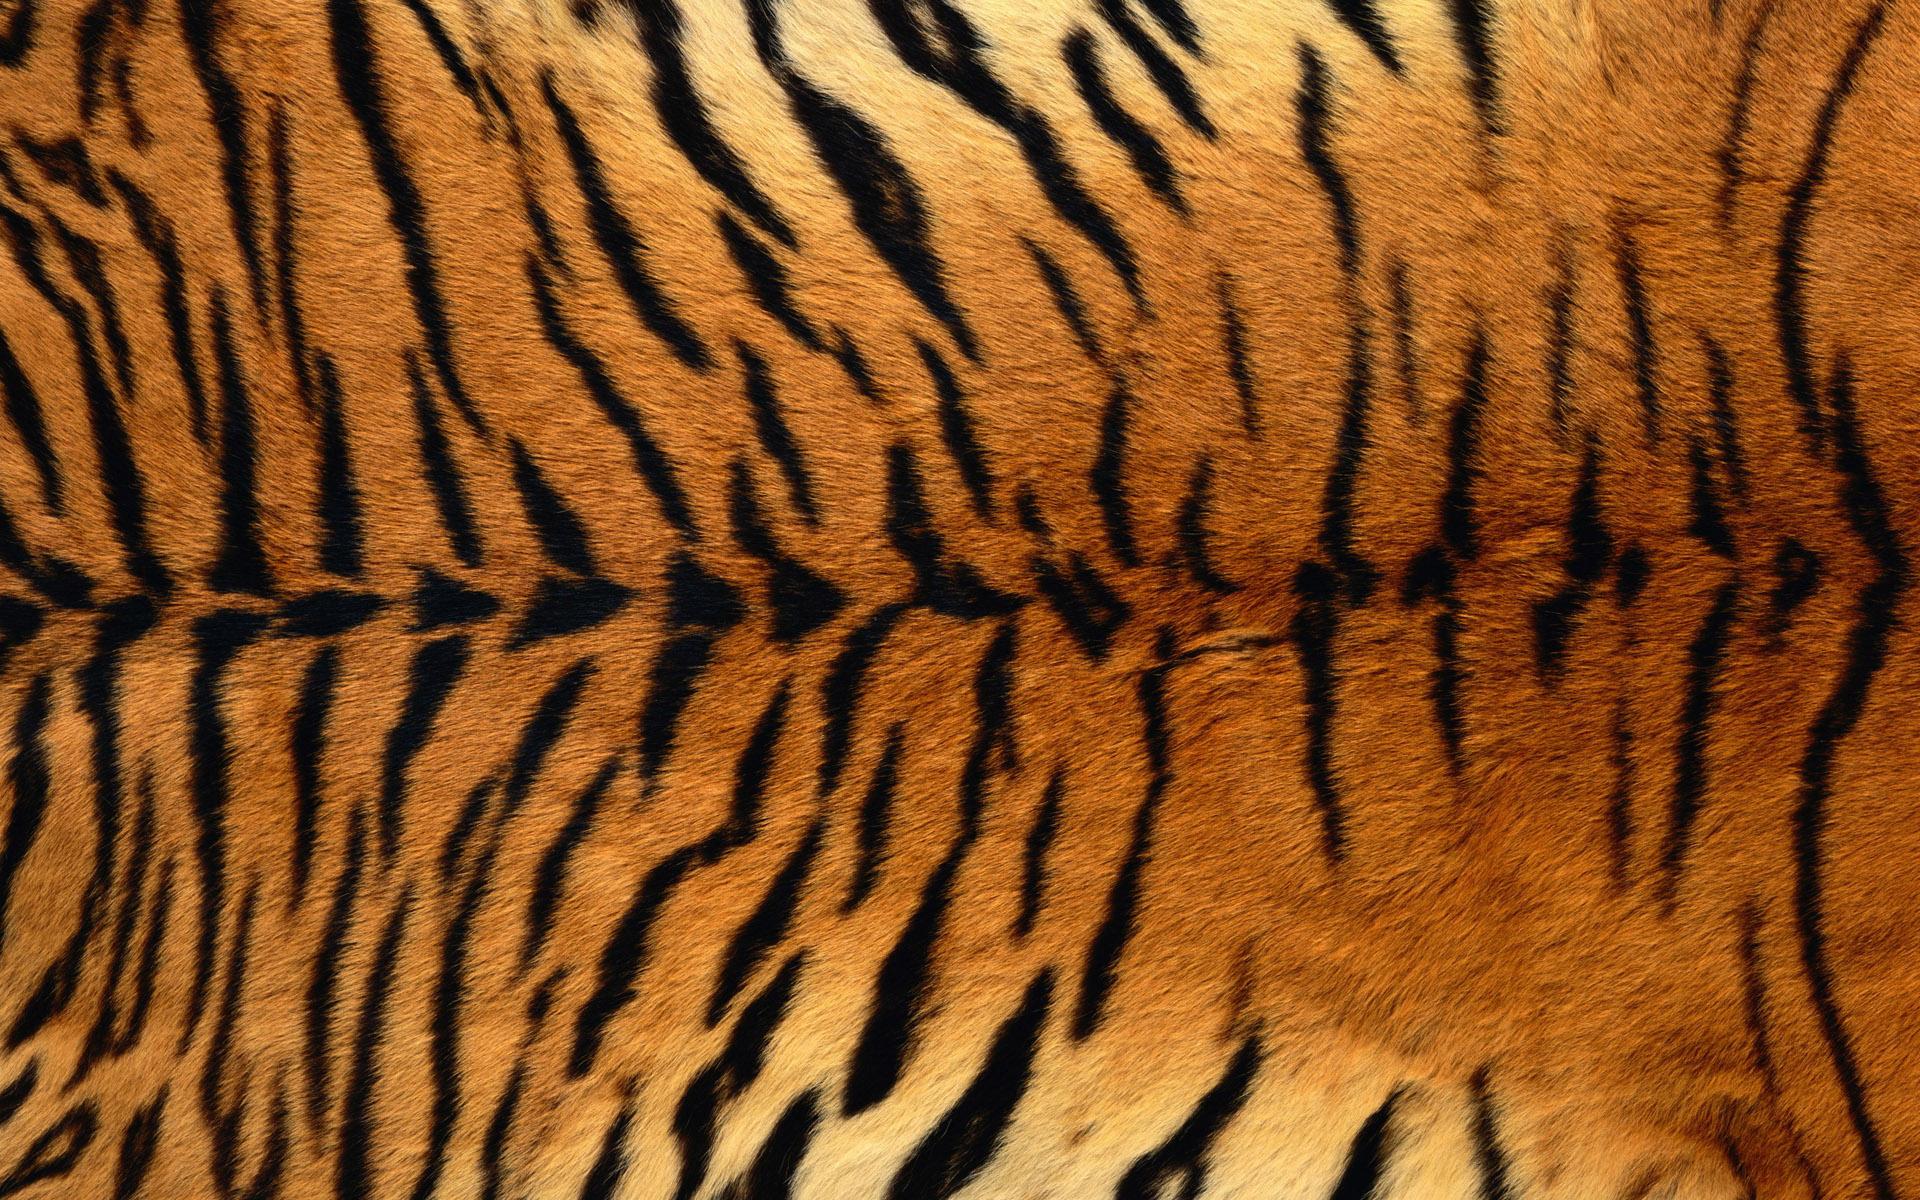 Tiger print computer wallpapers desktop backgrounds for Printed wallpaper